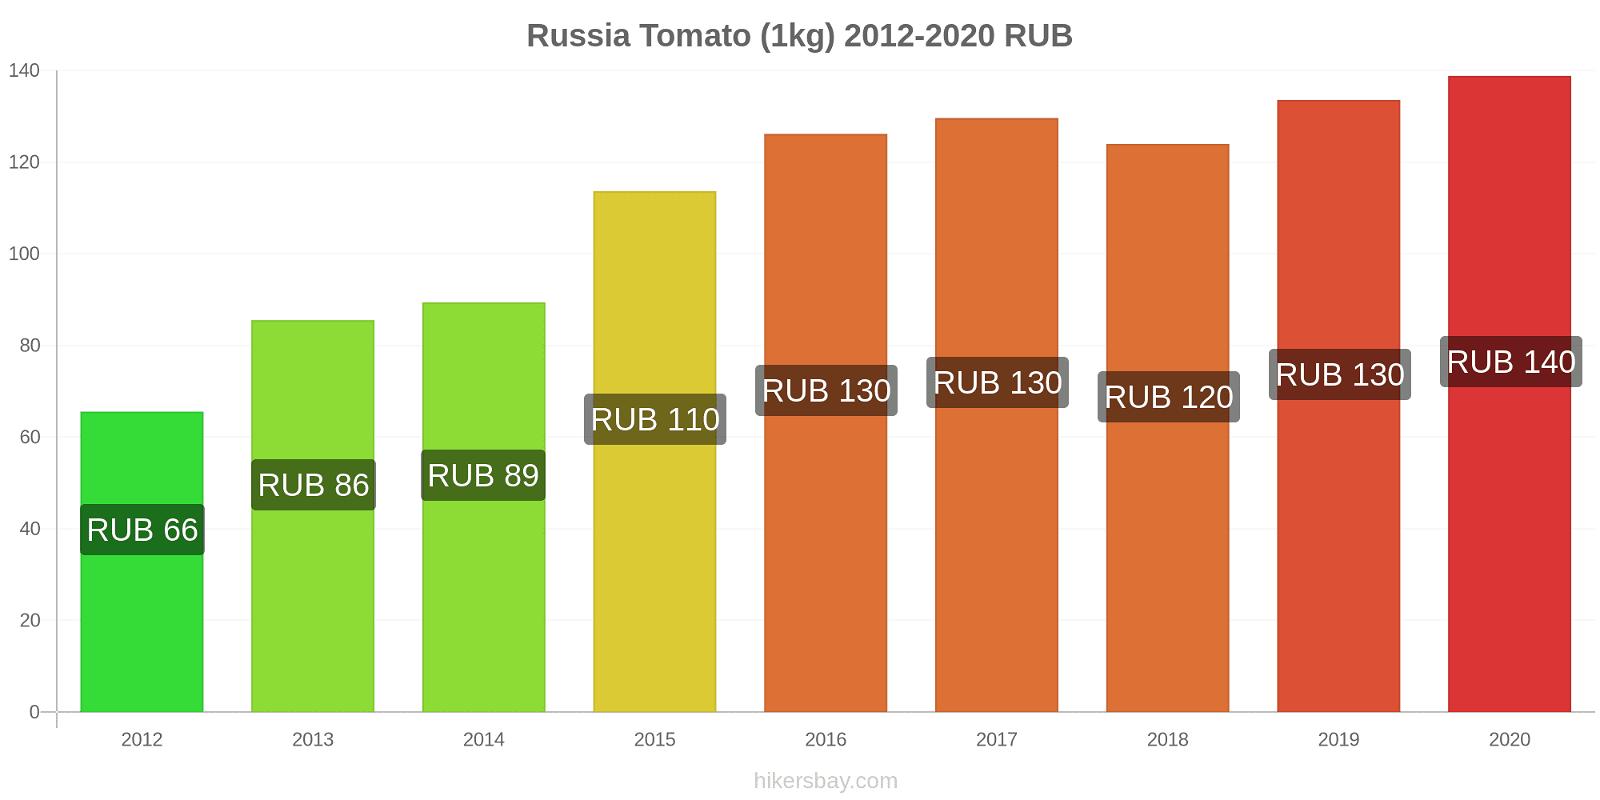 Russia price changes Tomato (1kg) hikersbay.com